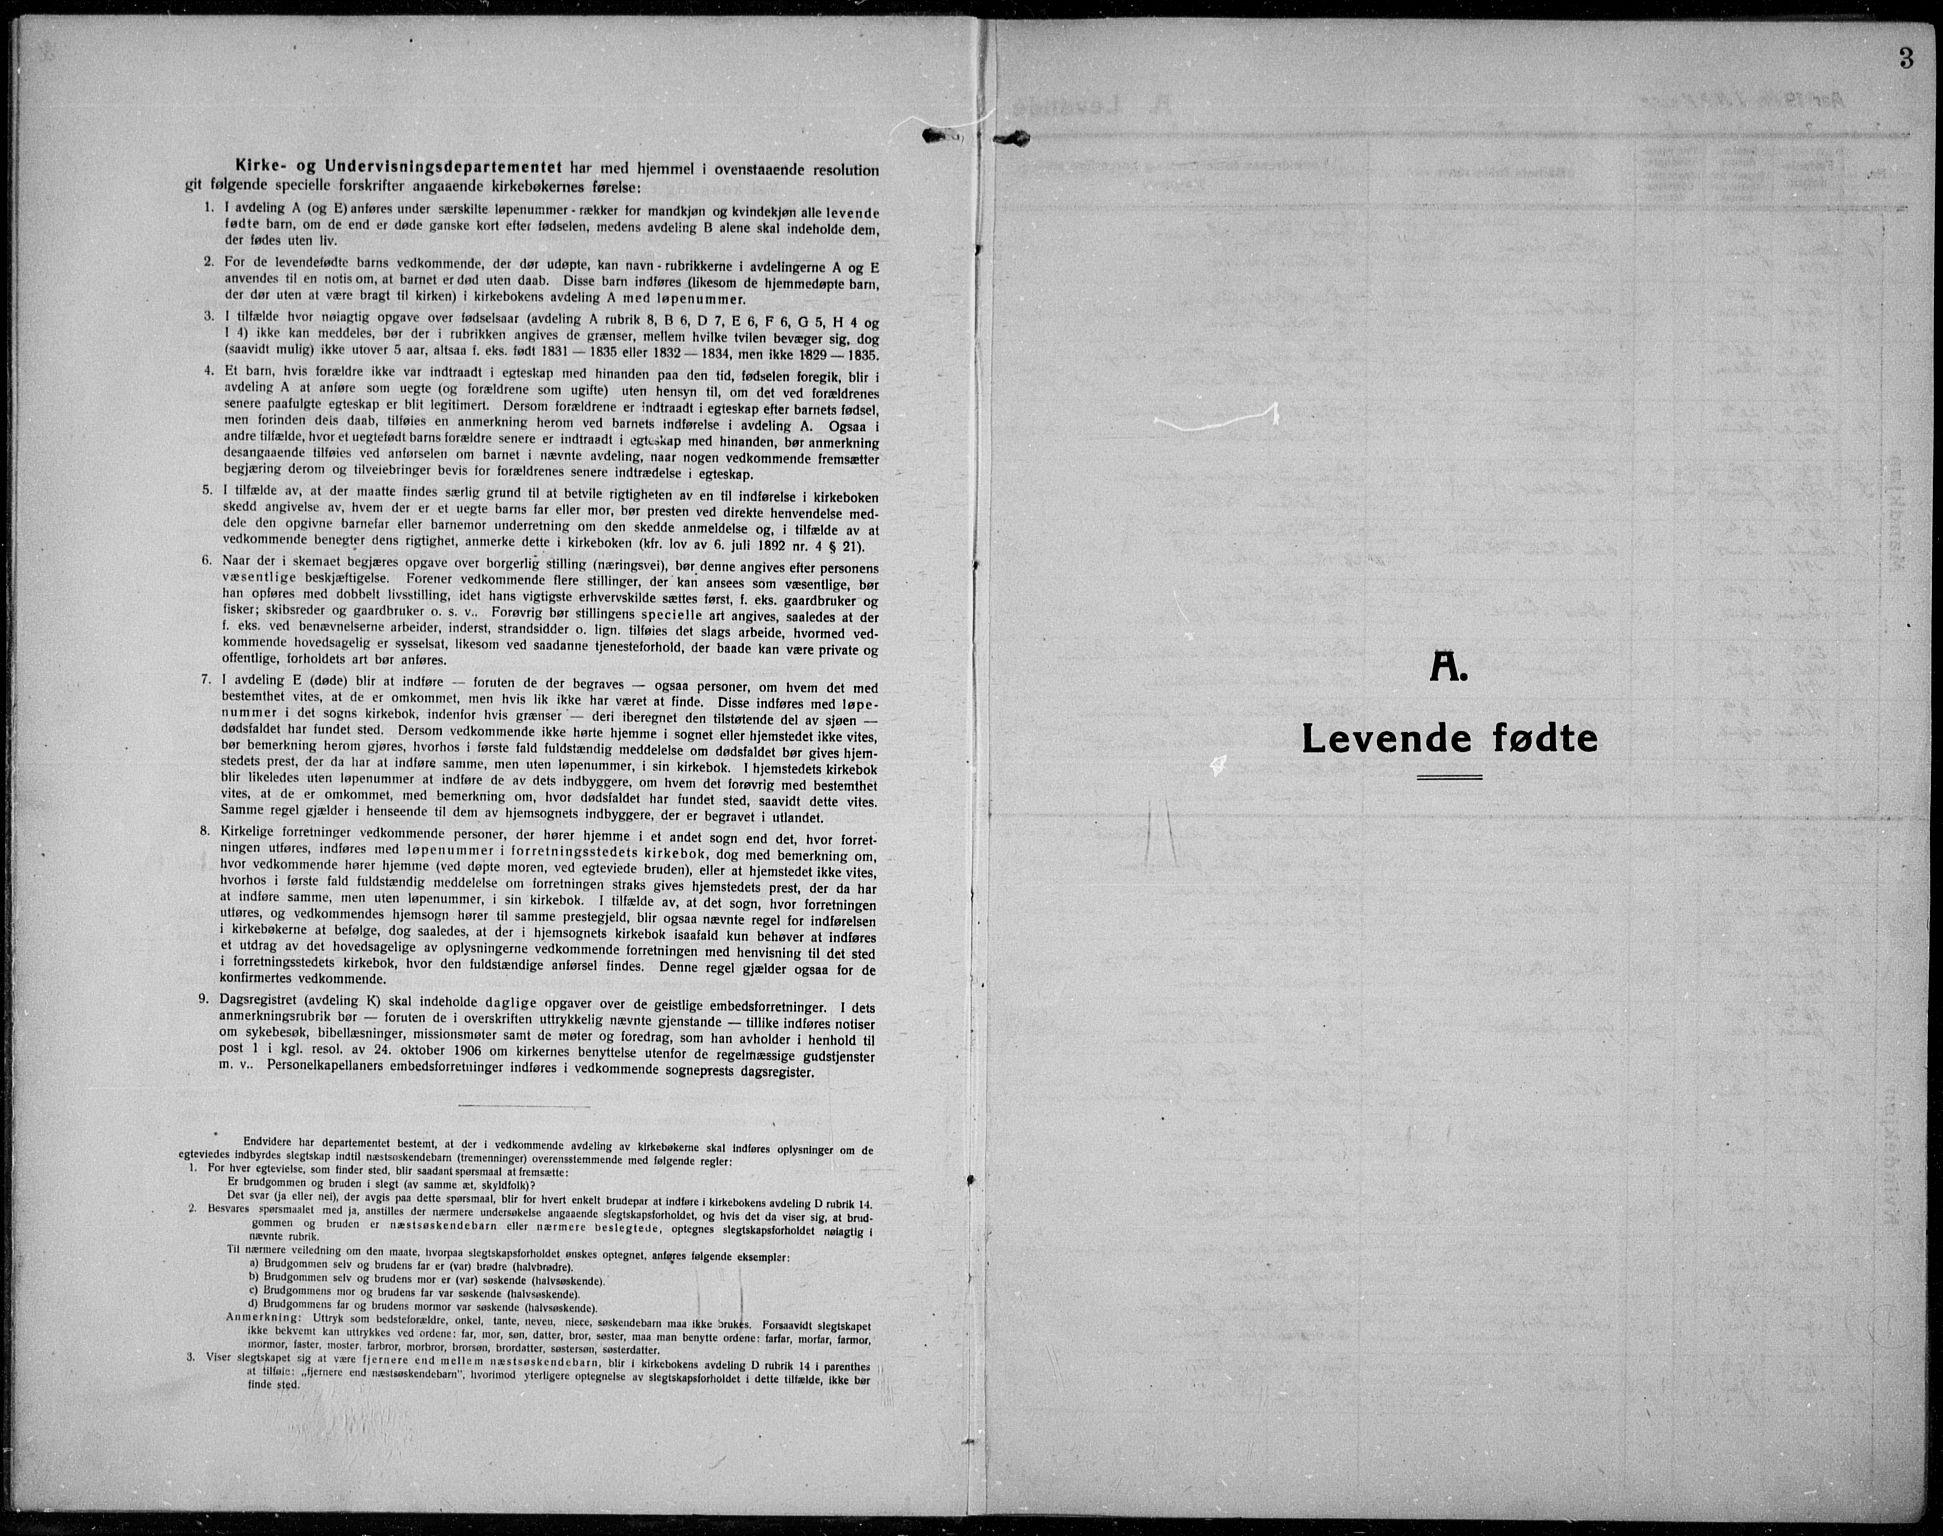 SAH, Jevnaker prestekontor, Ministerialbok nr. 12, 1914-1924, s. 3